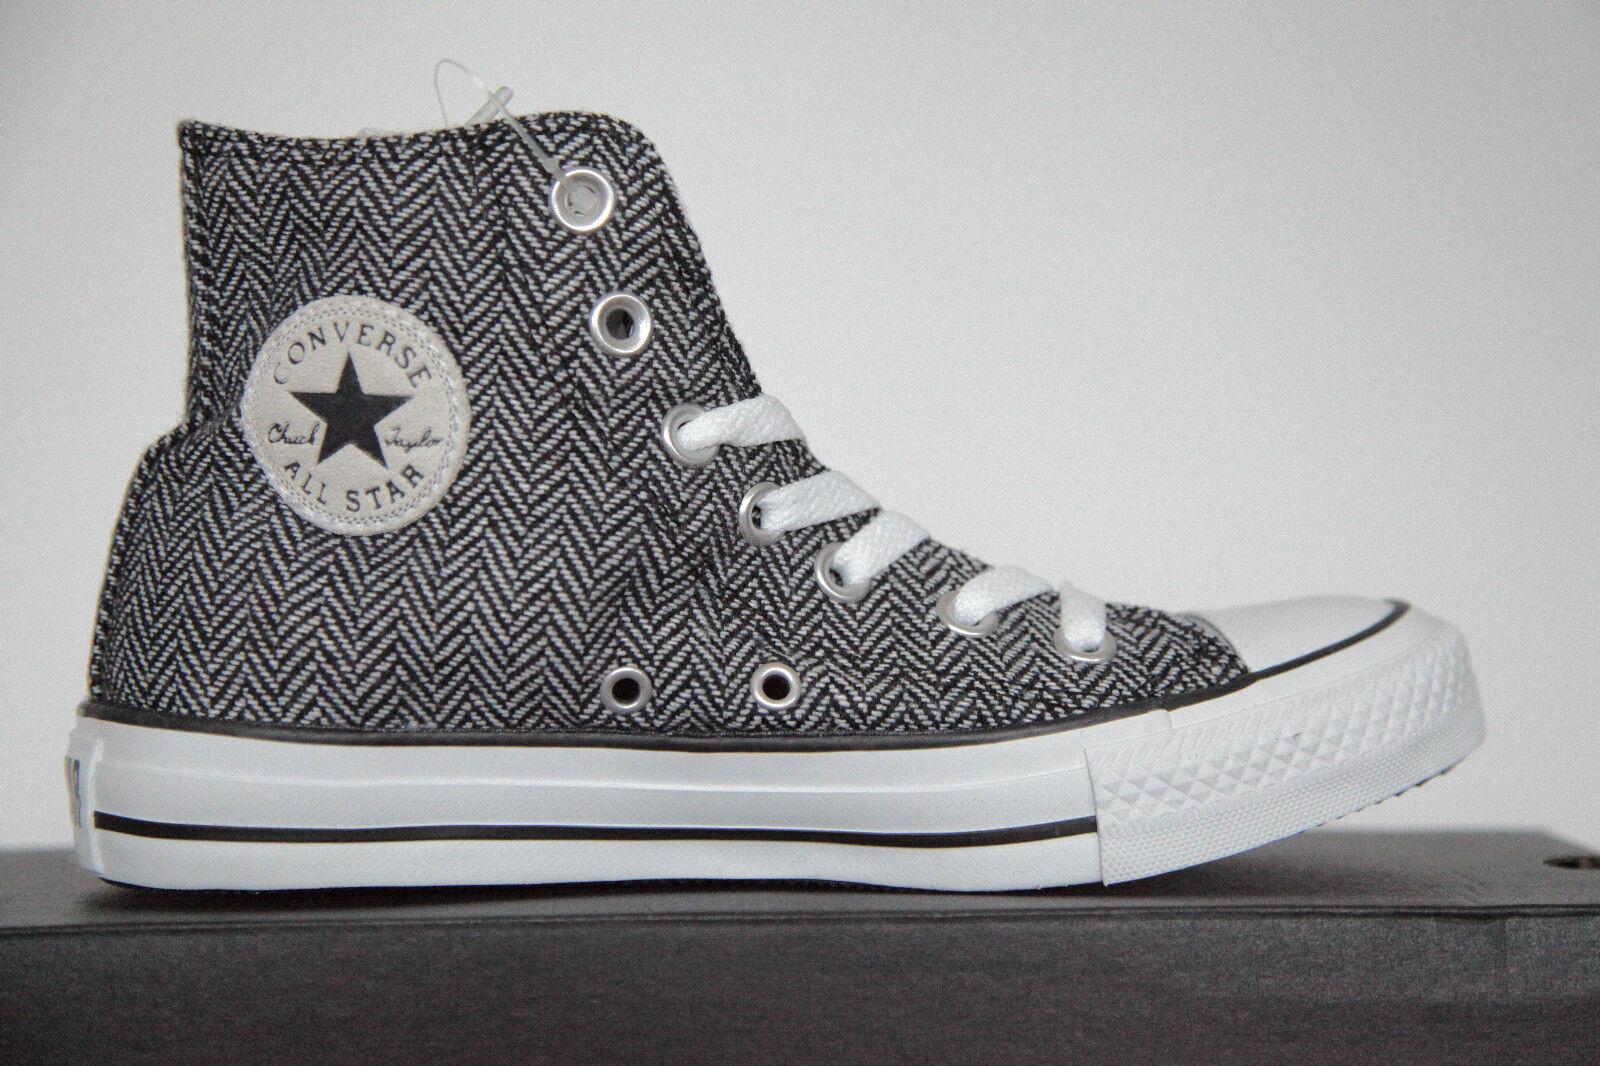 Neu Converse Chucks All Star Hi Punk Tex 135280c Fishbone Gr.36 UK 3,5 (79)